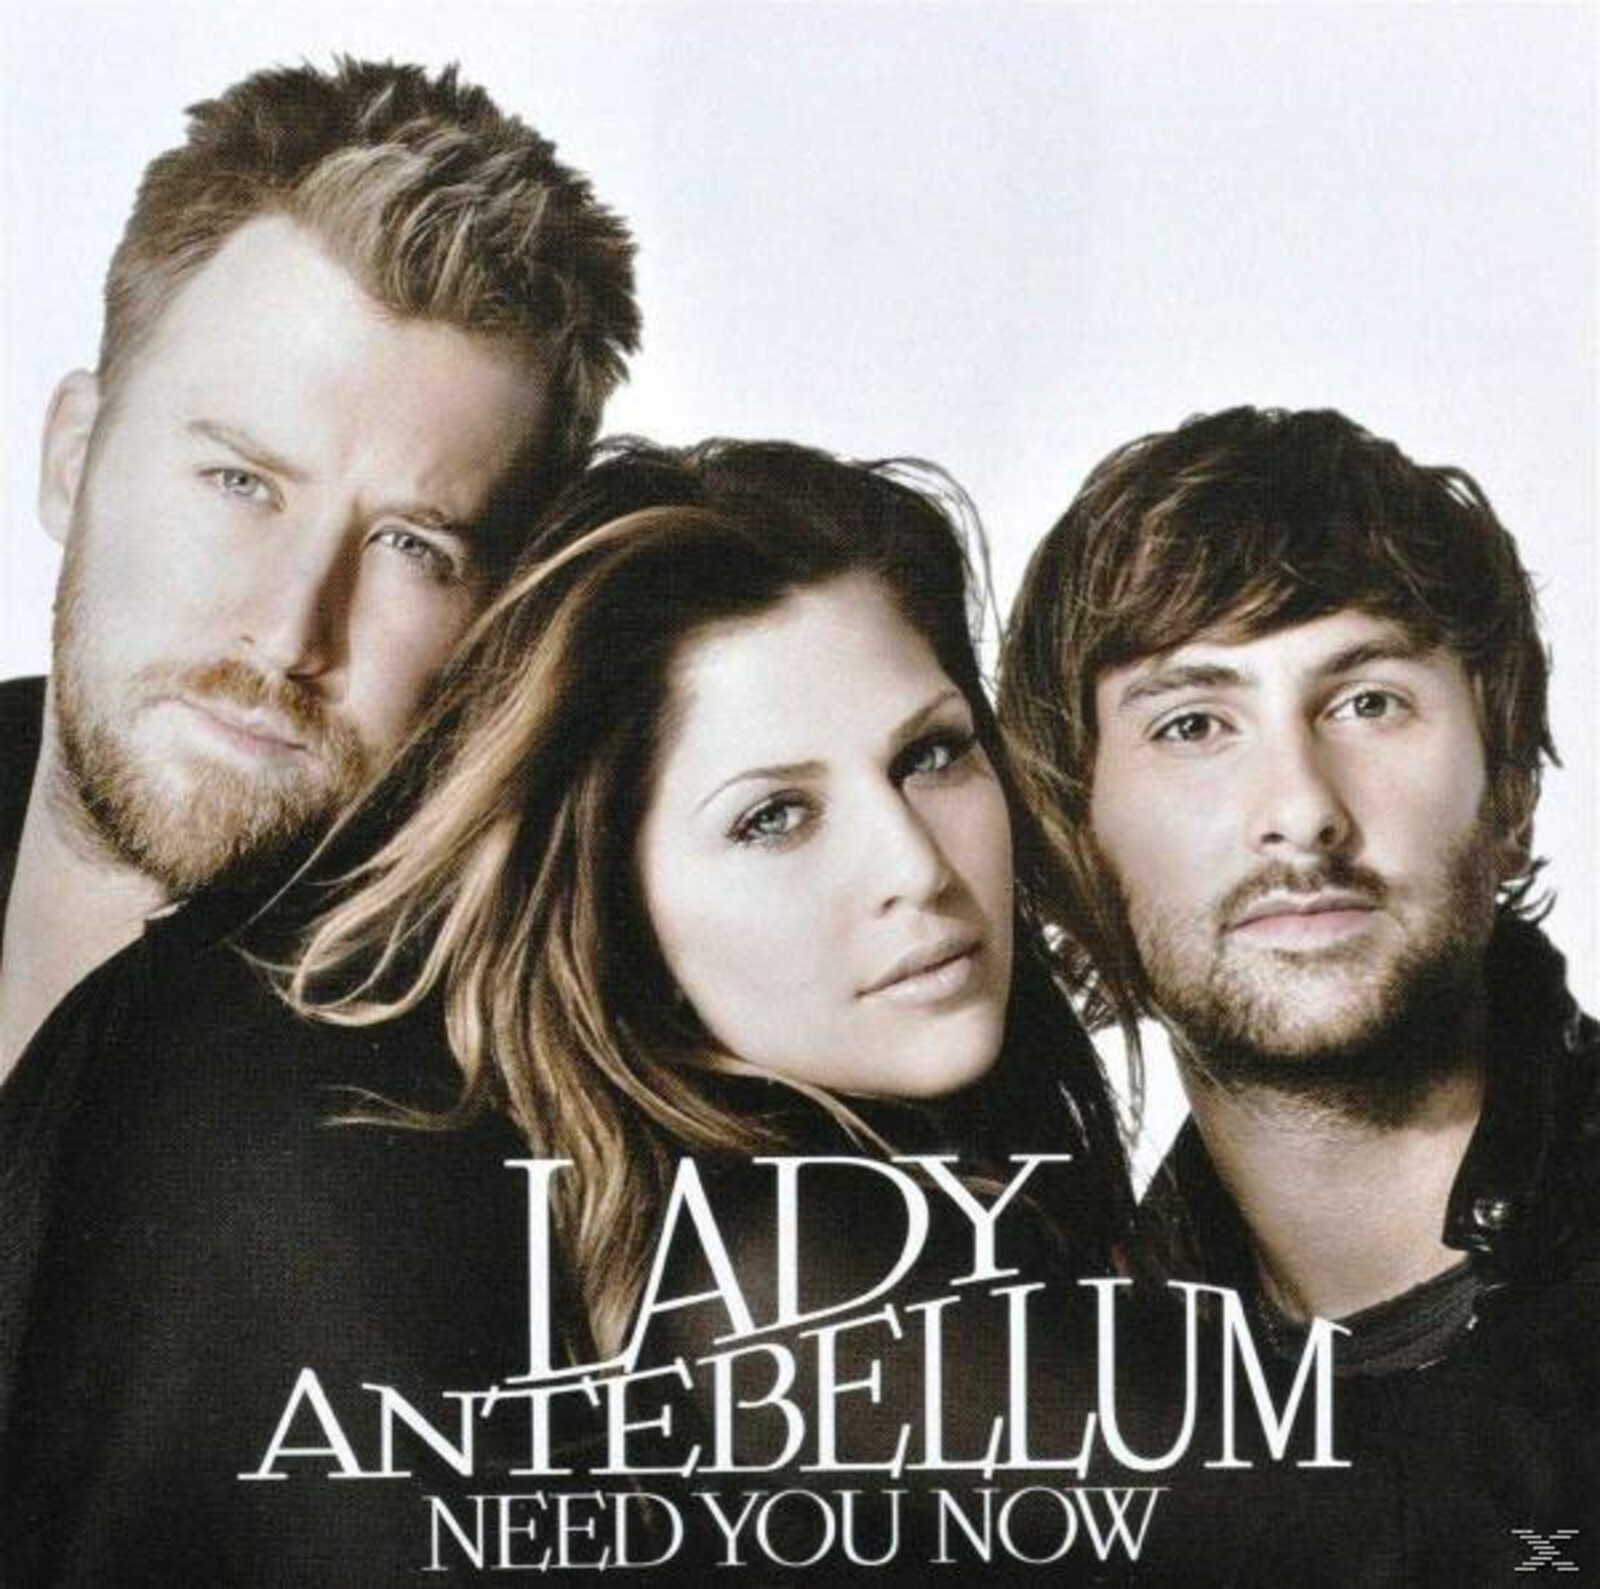 Lady Antebellum - Lady Antebellum - Need You Now [CD]